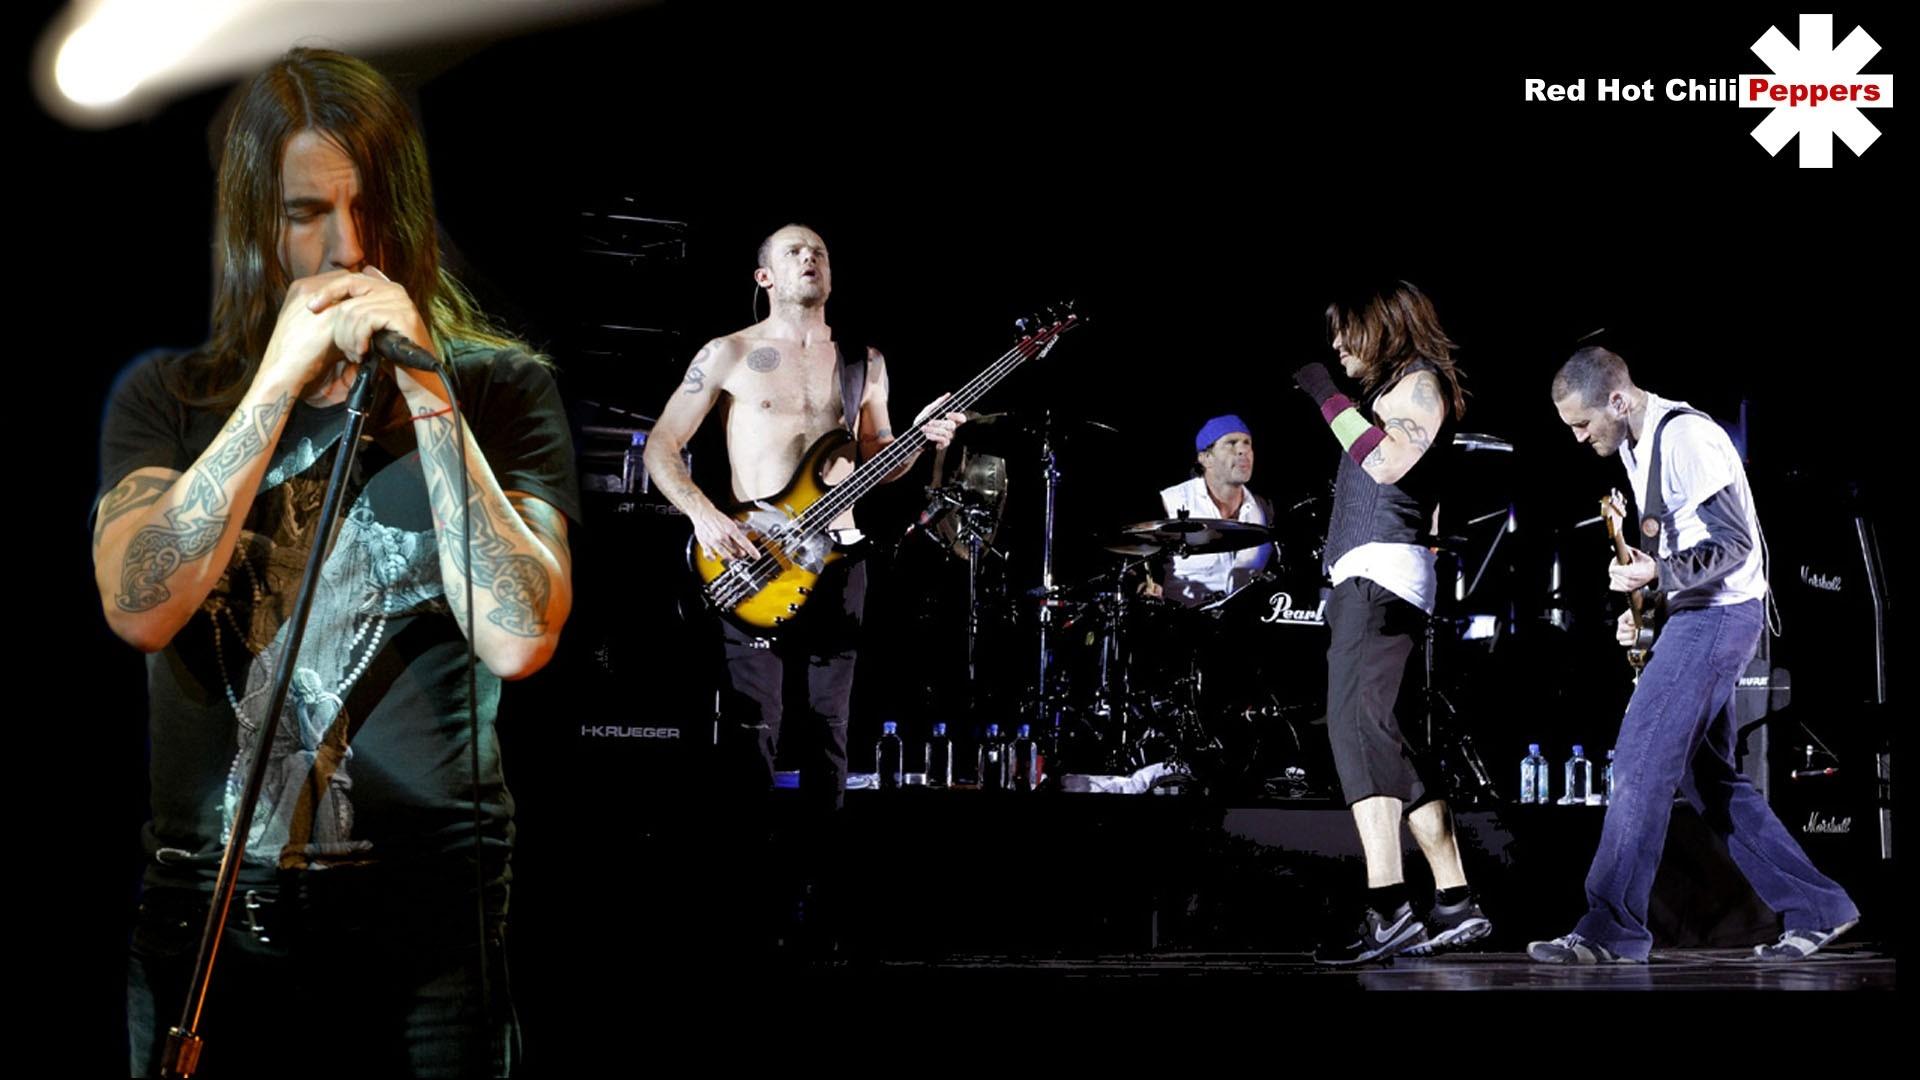 Wallpaper Red Hot Chili Peppers Scene Show Tatoo Light